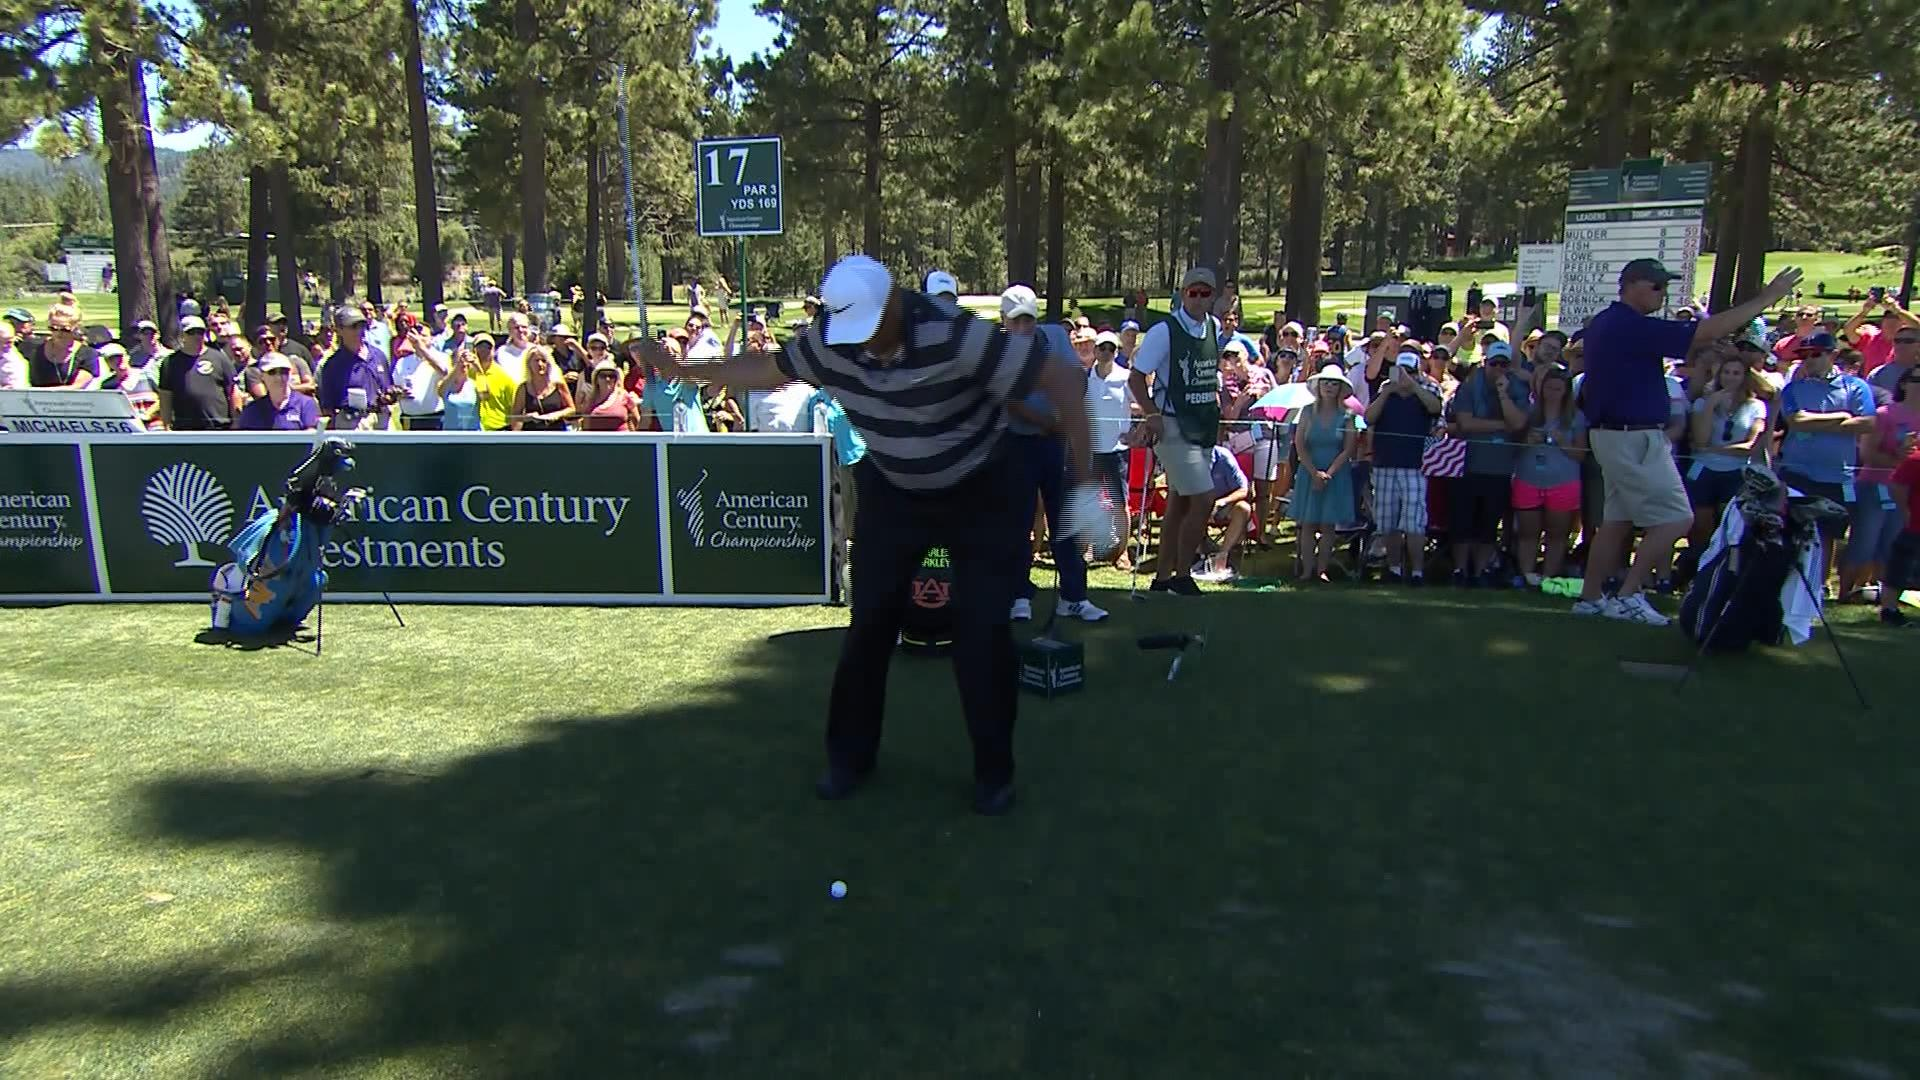 https://golfchannel.akamaized.net/ramp/423/107/071617_acc_barkley_one_arm.jpg